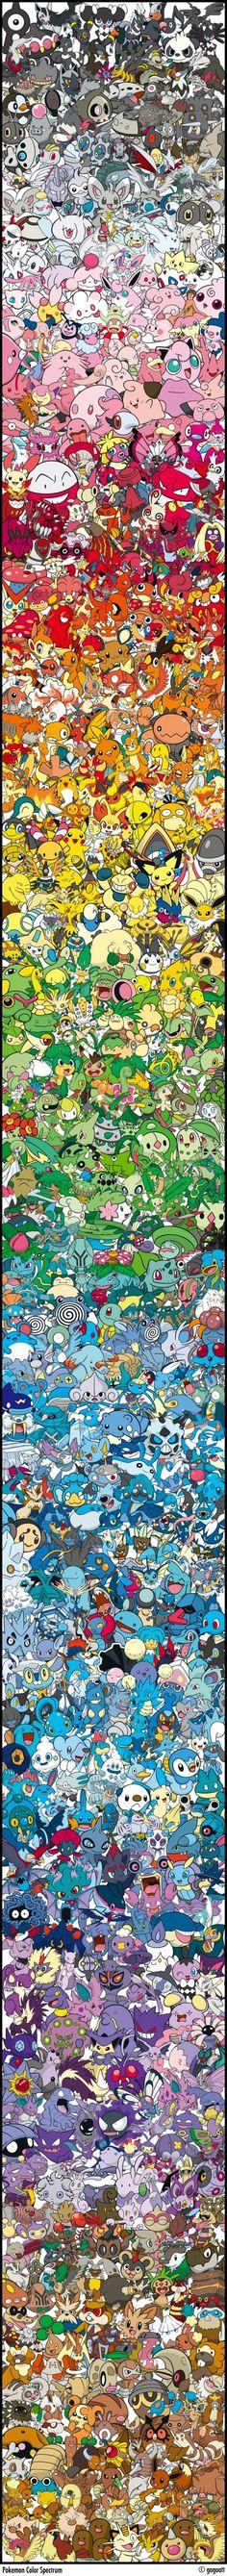 Every Single Pokémon (Gen 1-6) Arranged by Color. Not including Mega Evolutions.